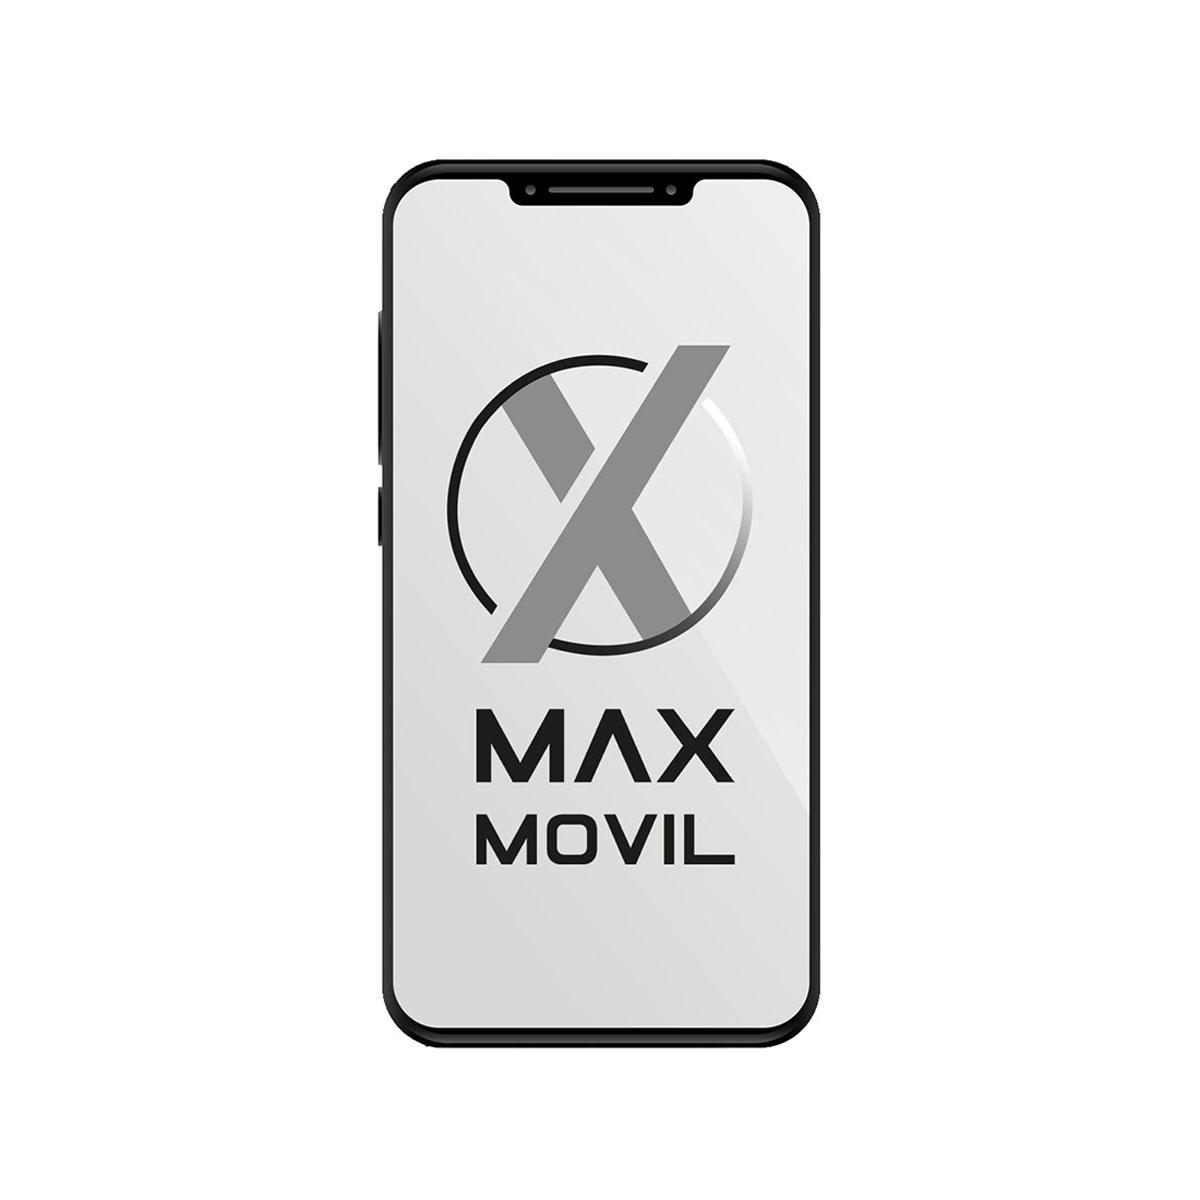 Cable HDMI V1.4 macho/macho 5m 93022